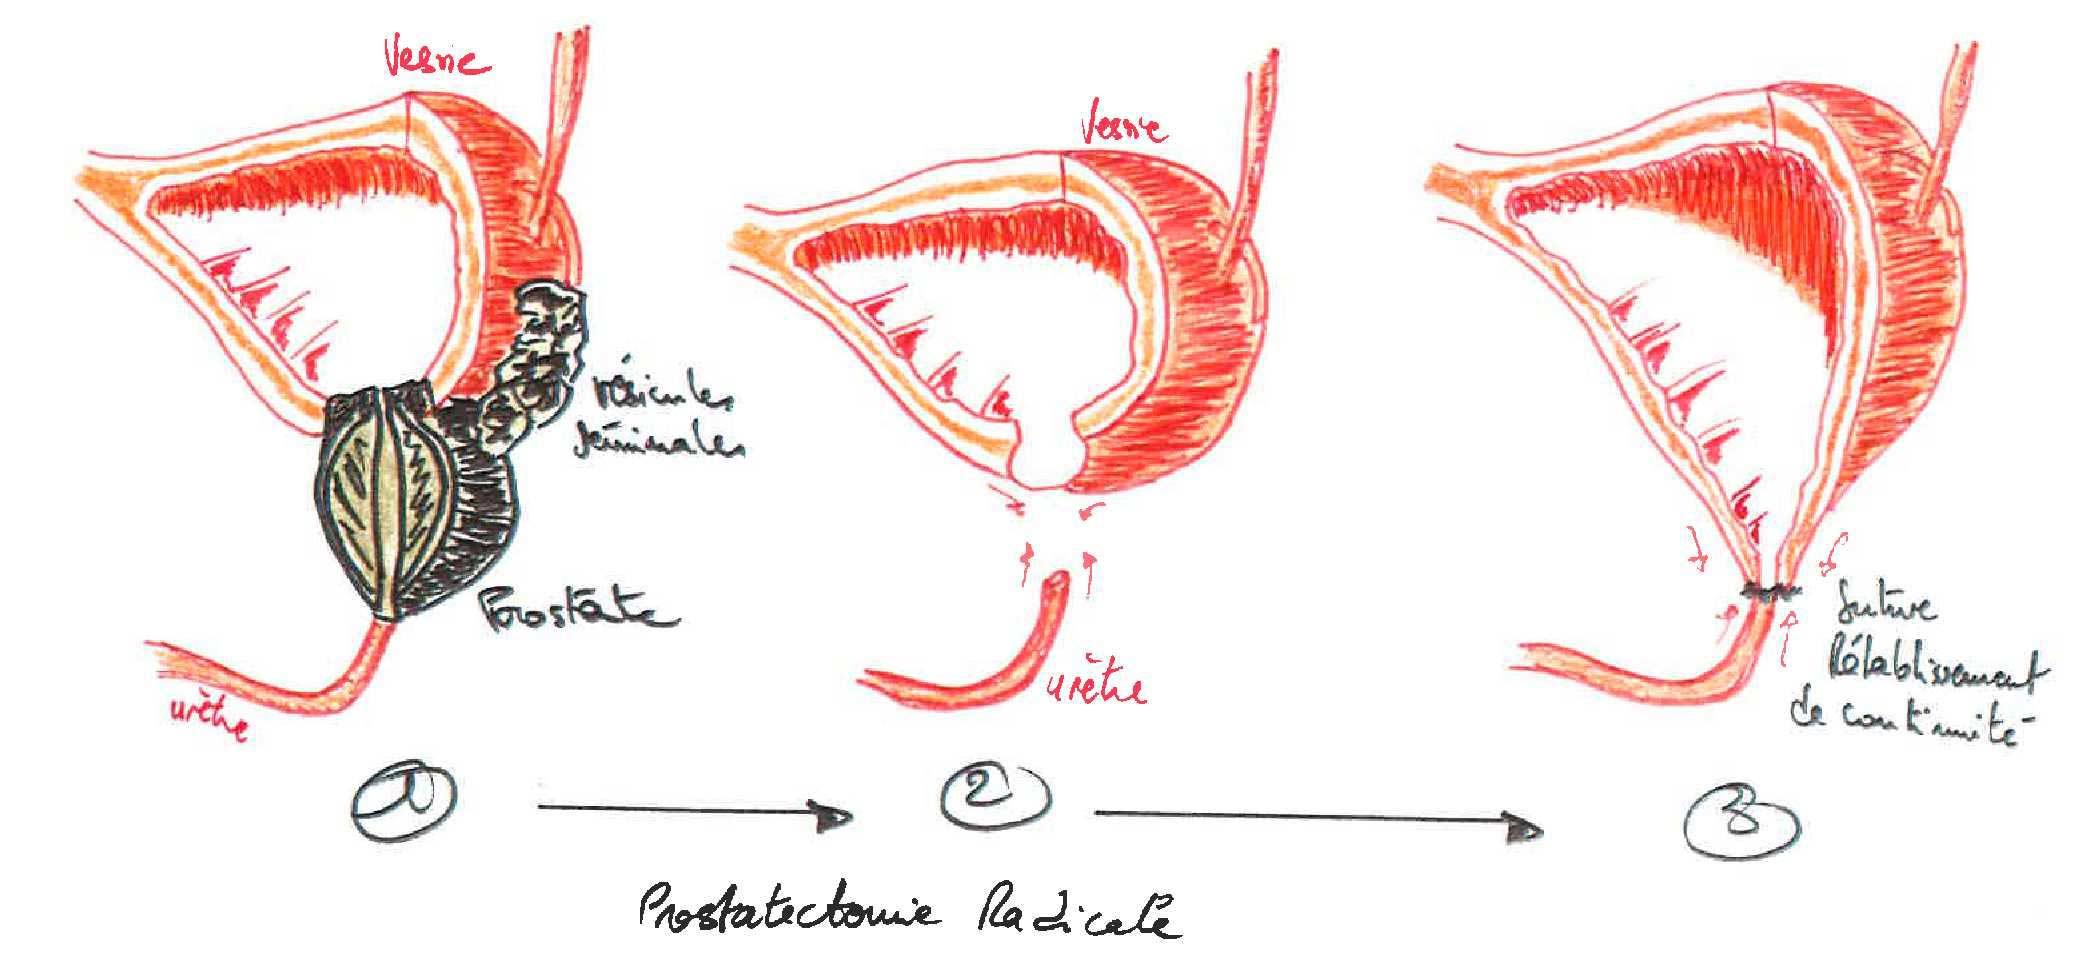 Prostatectomia radicale e incontinenza